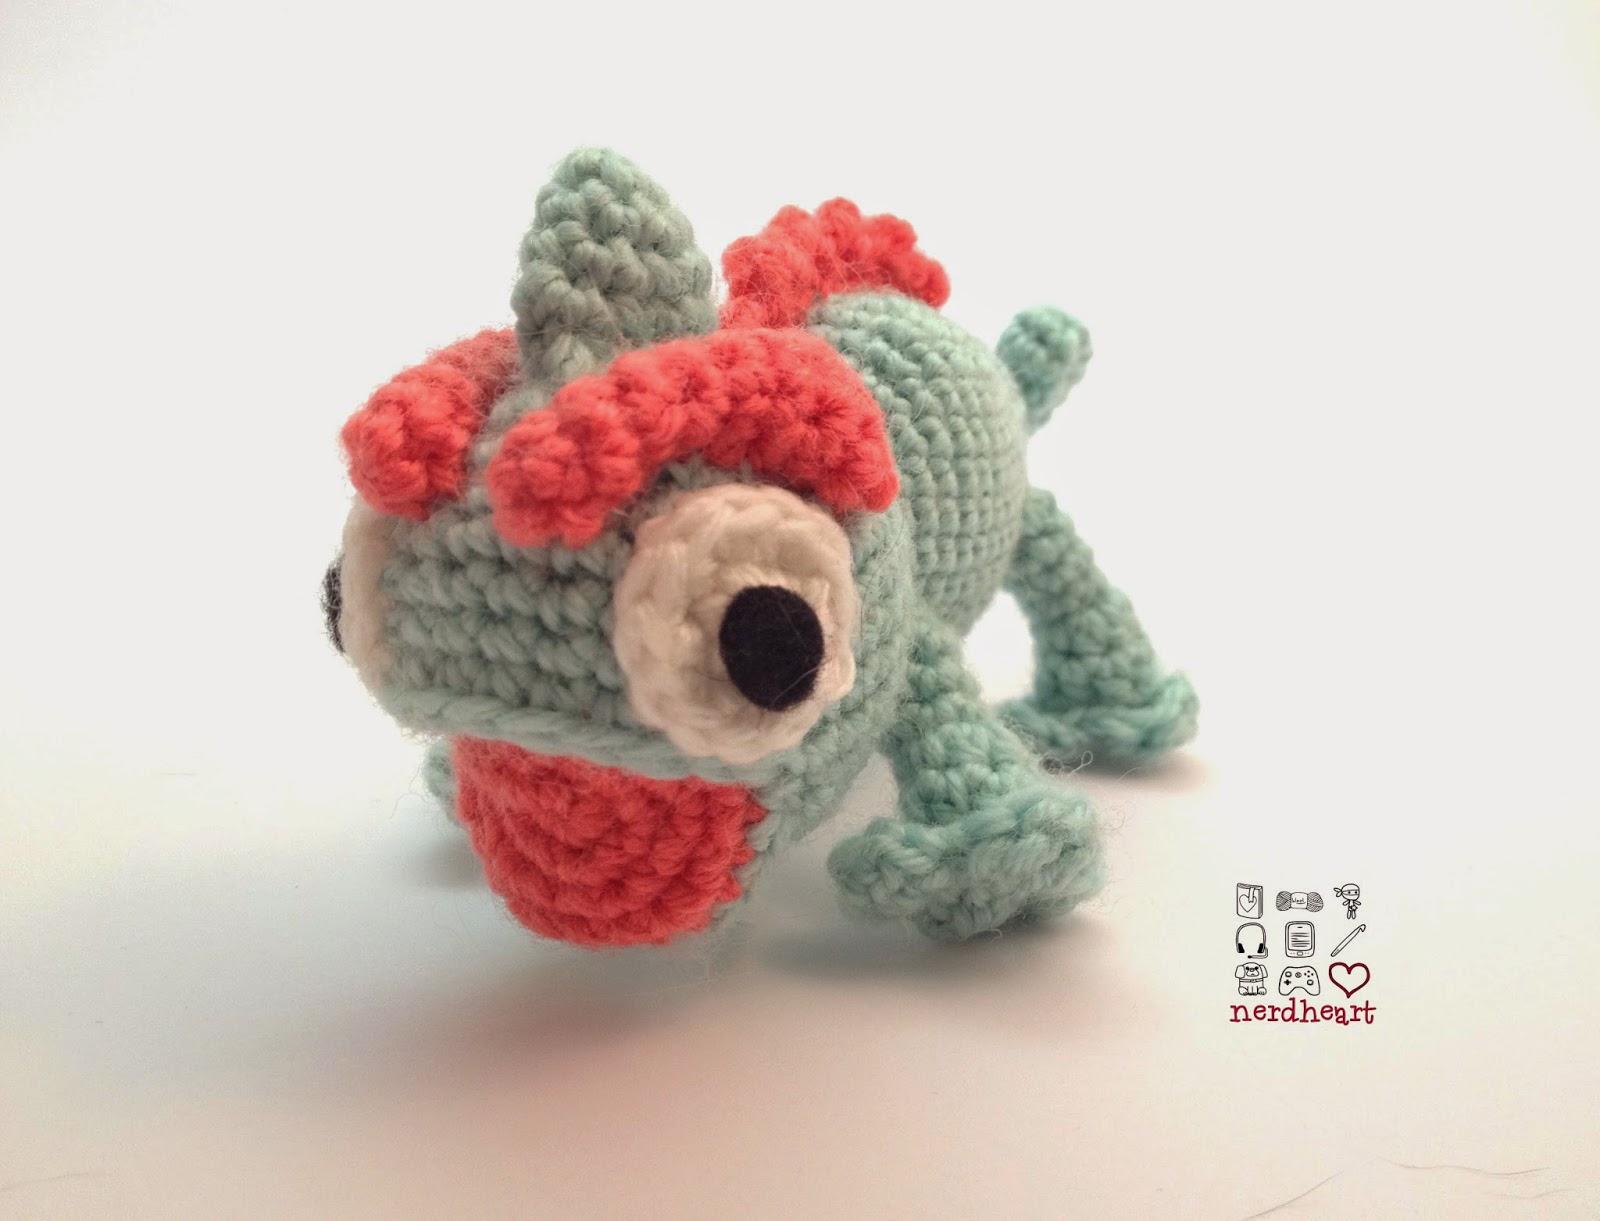 Amigurumi Chameleon Free Pattern : Nerdheart: Crochet Chameleons